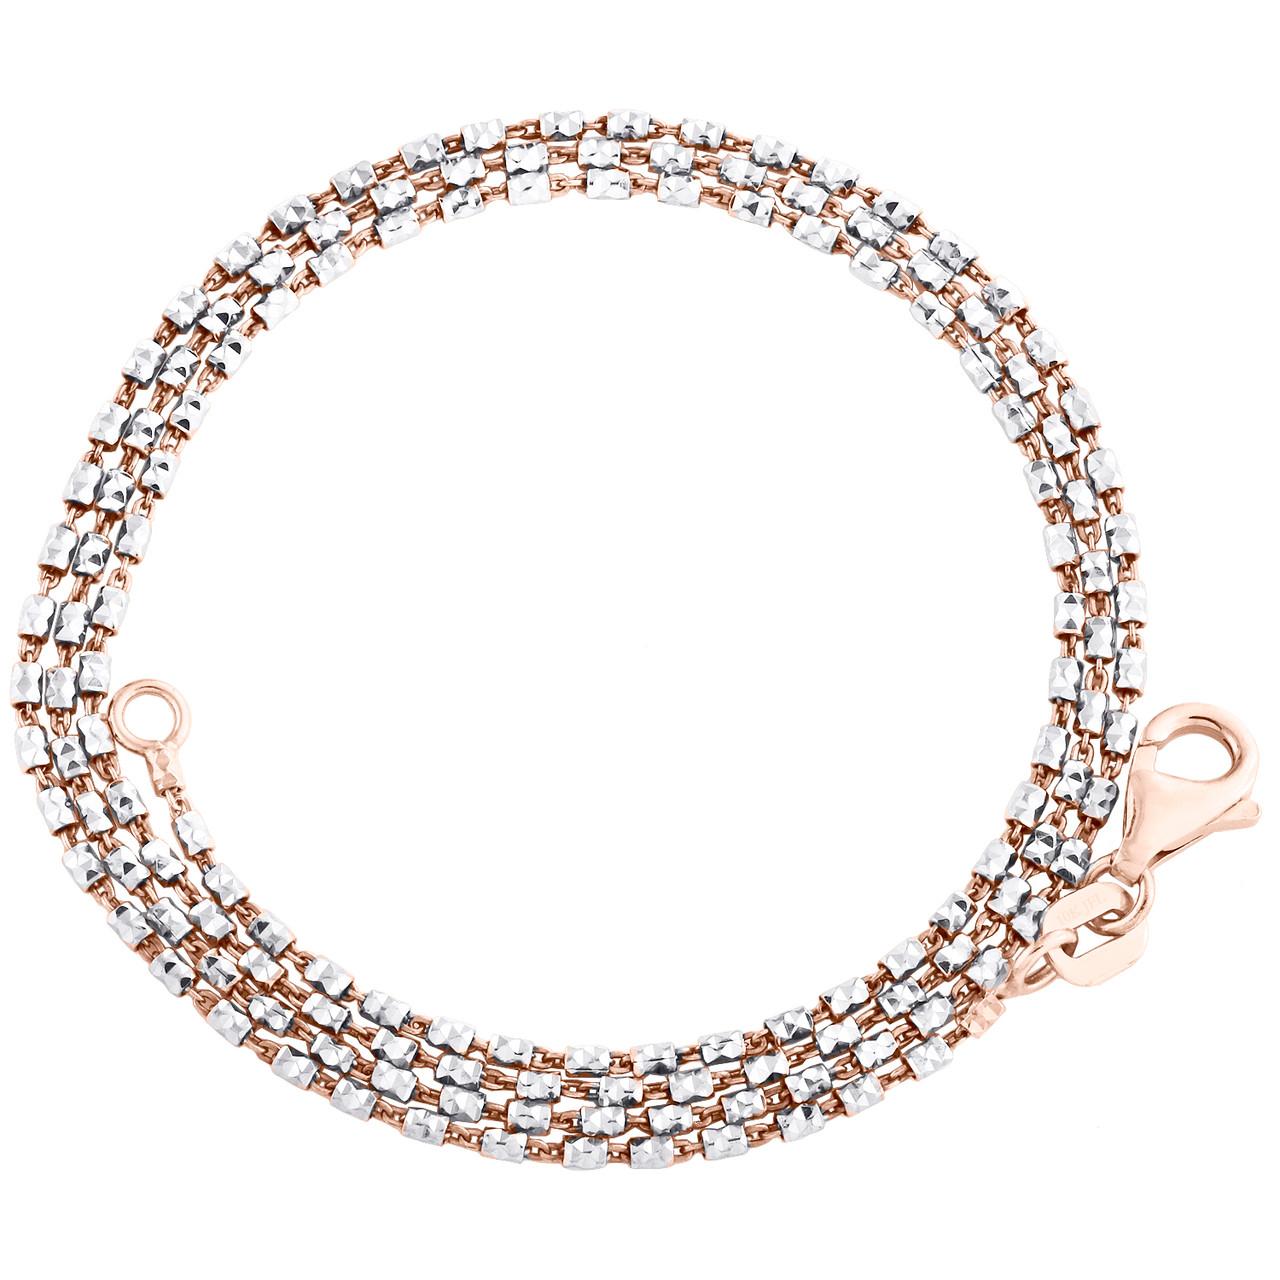 $30 Scarf One Size Surell Girls/' Cheetah Faux Fur Collar Headband 6-14